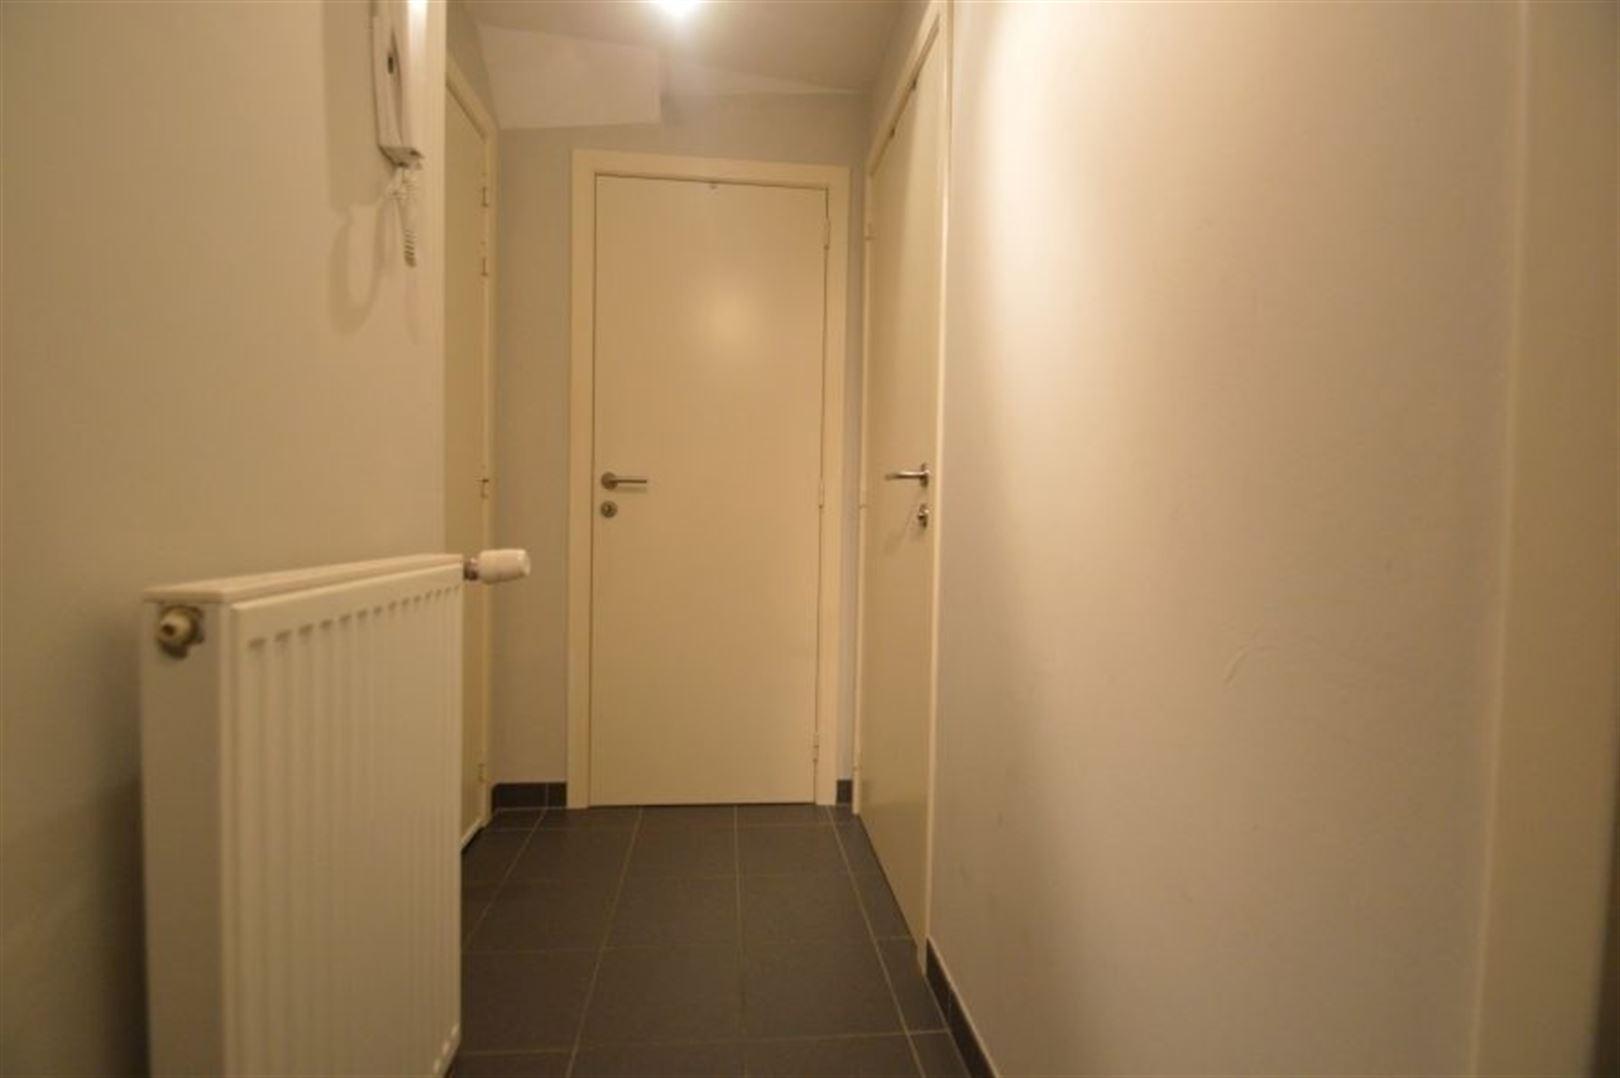 Foto 3 : Appartement te 9200 Dendermonde (België) - Prijs € 470